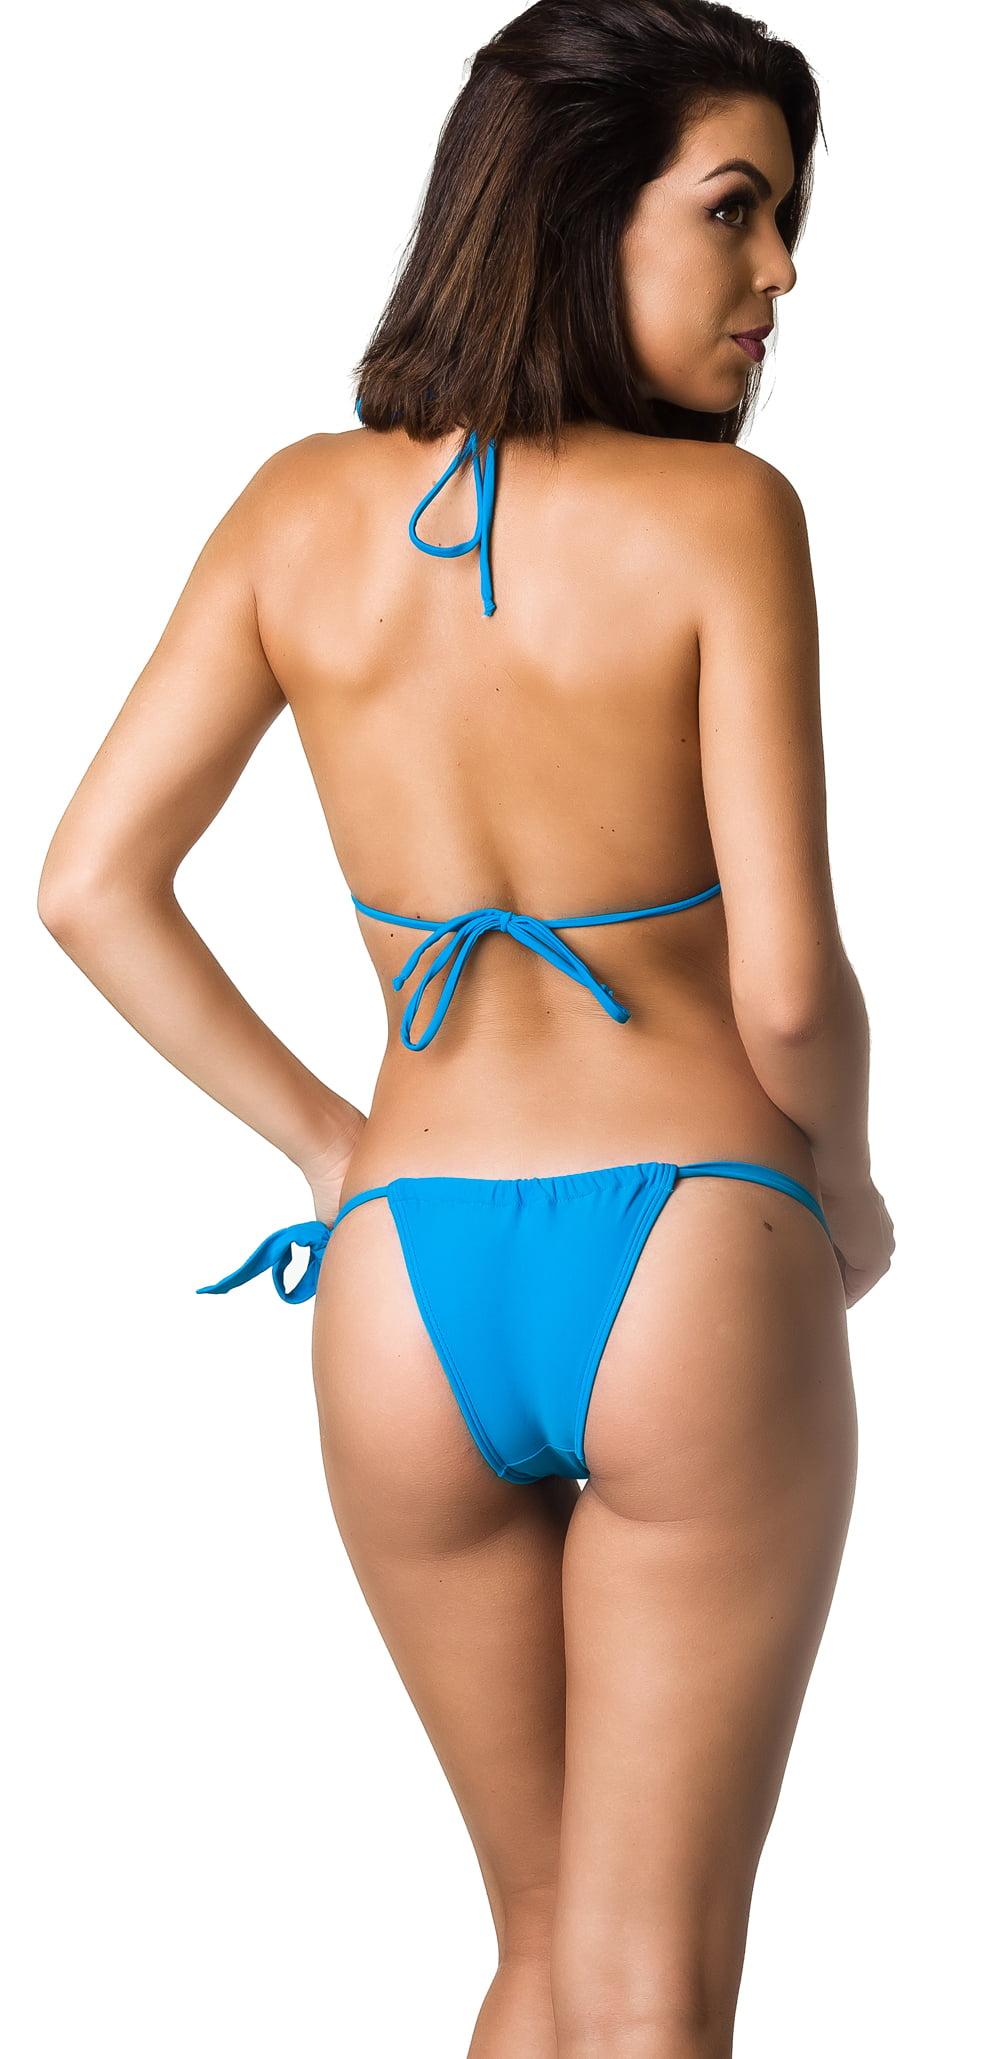 f4013b11b1 COQUETA SWIMWEAR - Women's Coqueta Swimwear Bikini Bathing Suit Tonga  Brazilian Bikini SET Carioca Bottom Sexy Swimsuit BLUE-SM - Walmart.com